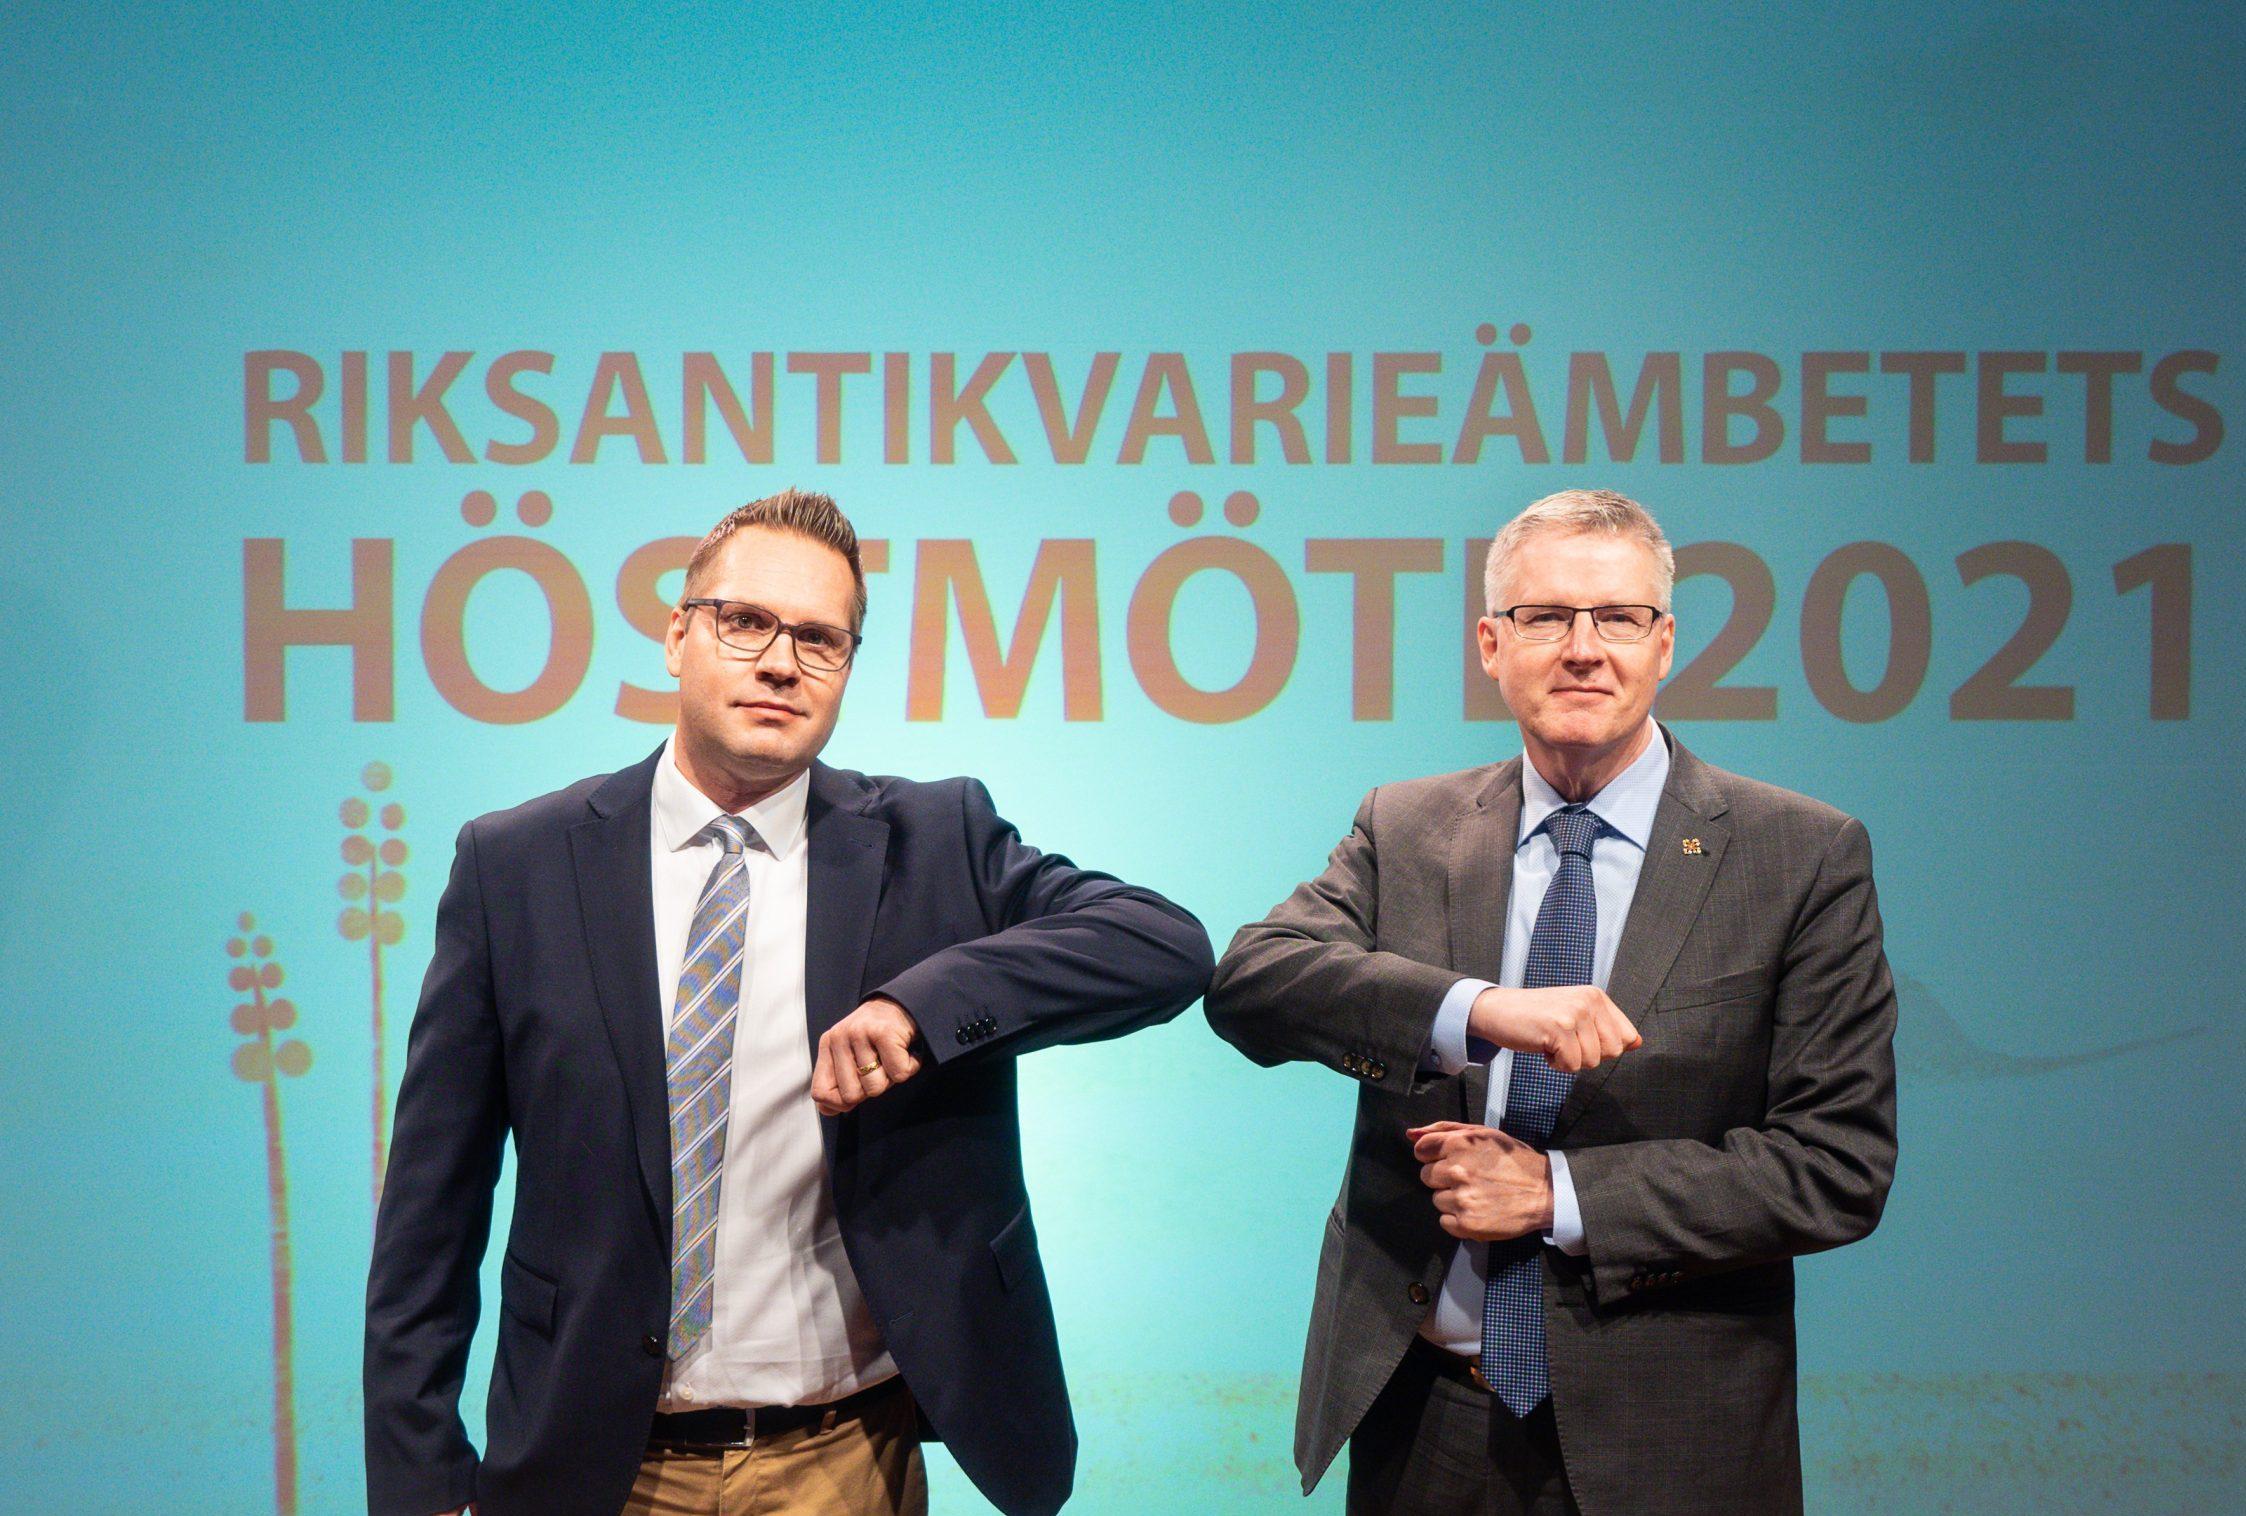 Joakim Malmström blir ny riksantikvarie